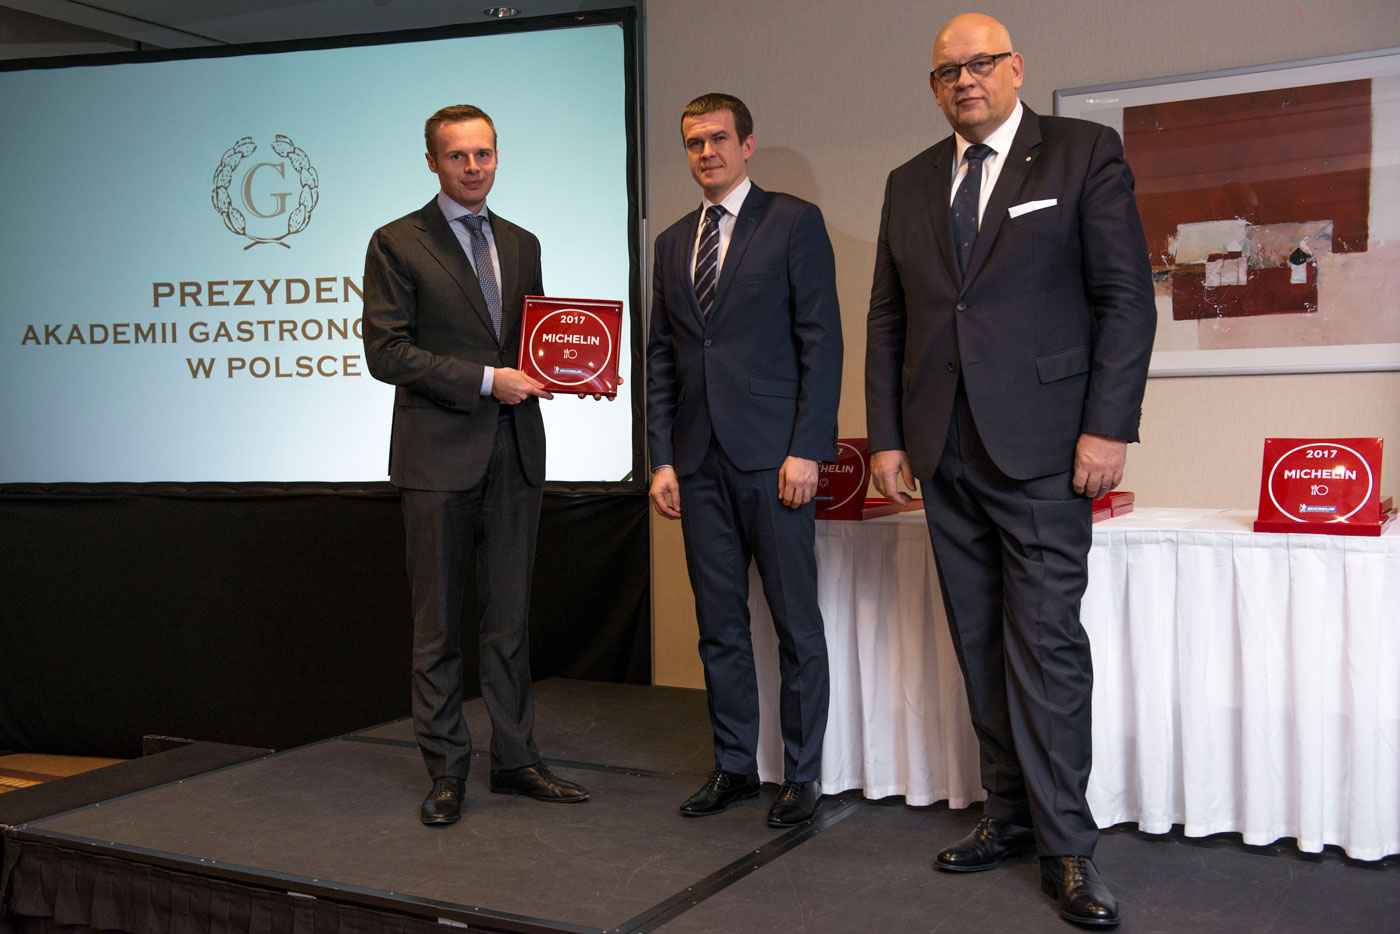 Restauracja Belvedere z Plakietą Michelin 2017